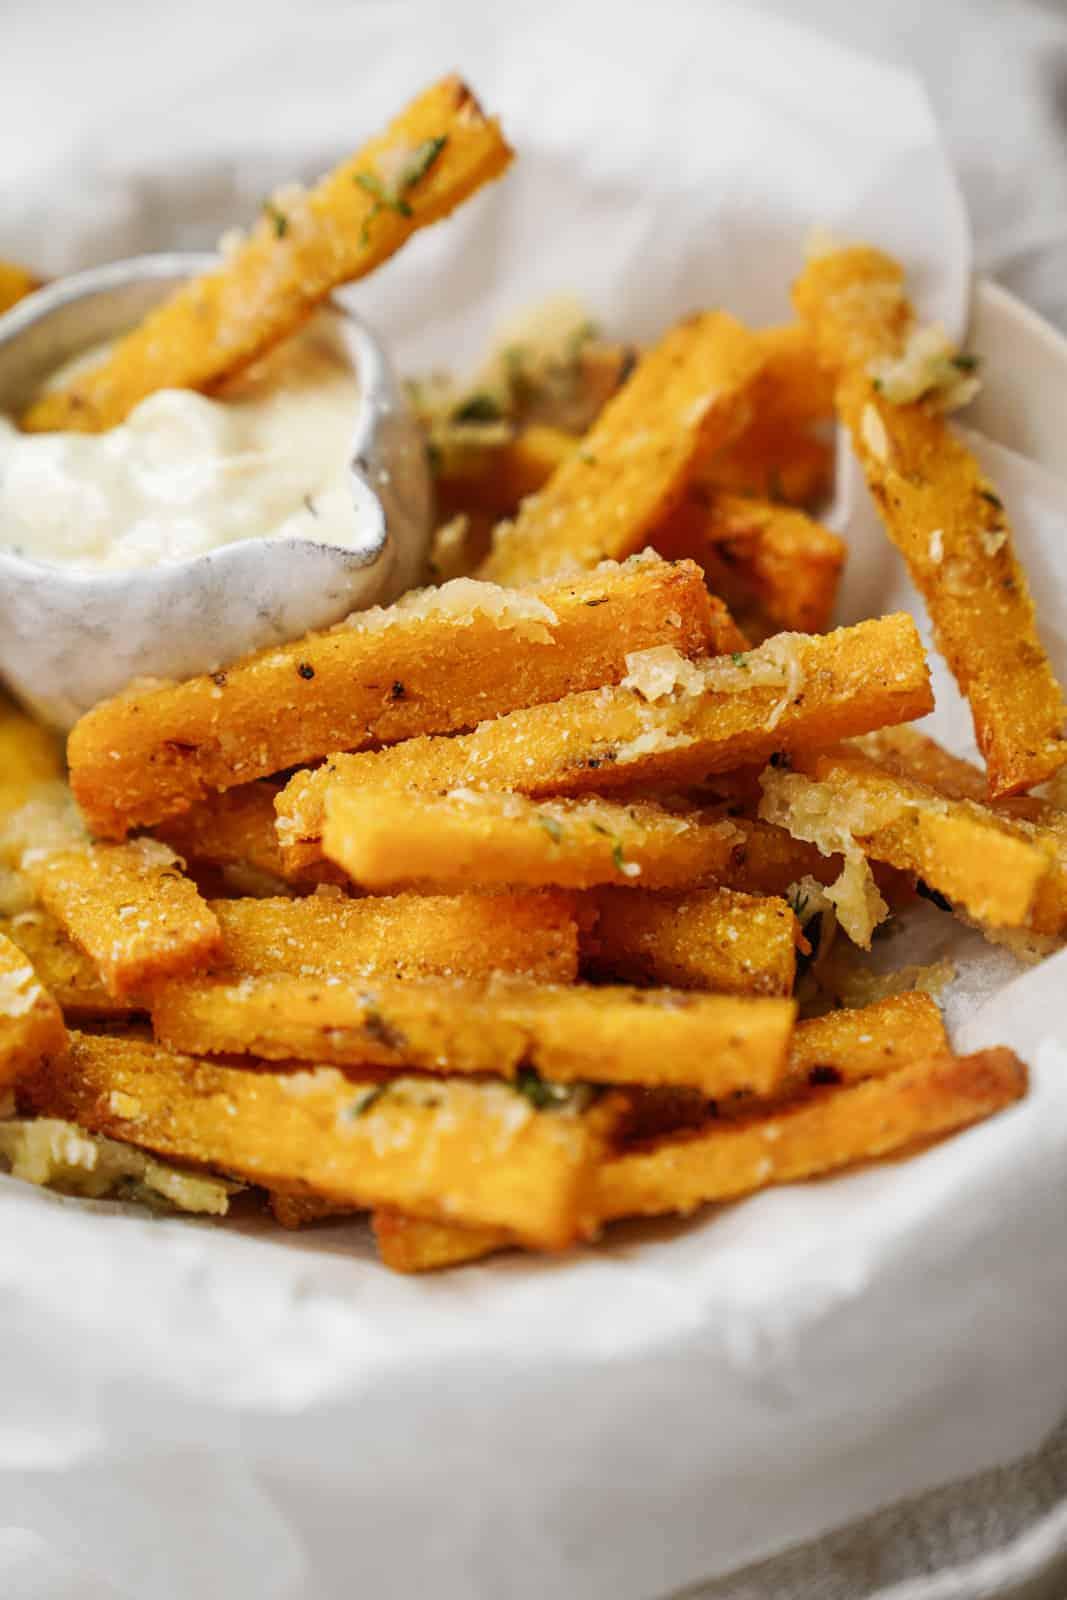 A bowl of vegan polenta fries with a side of vegan aioli